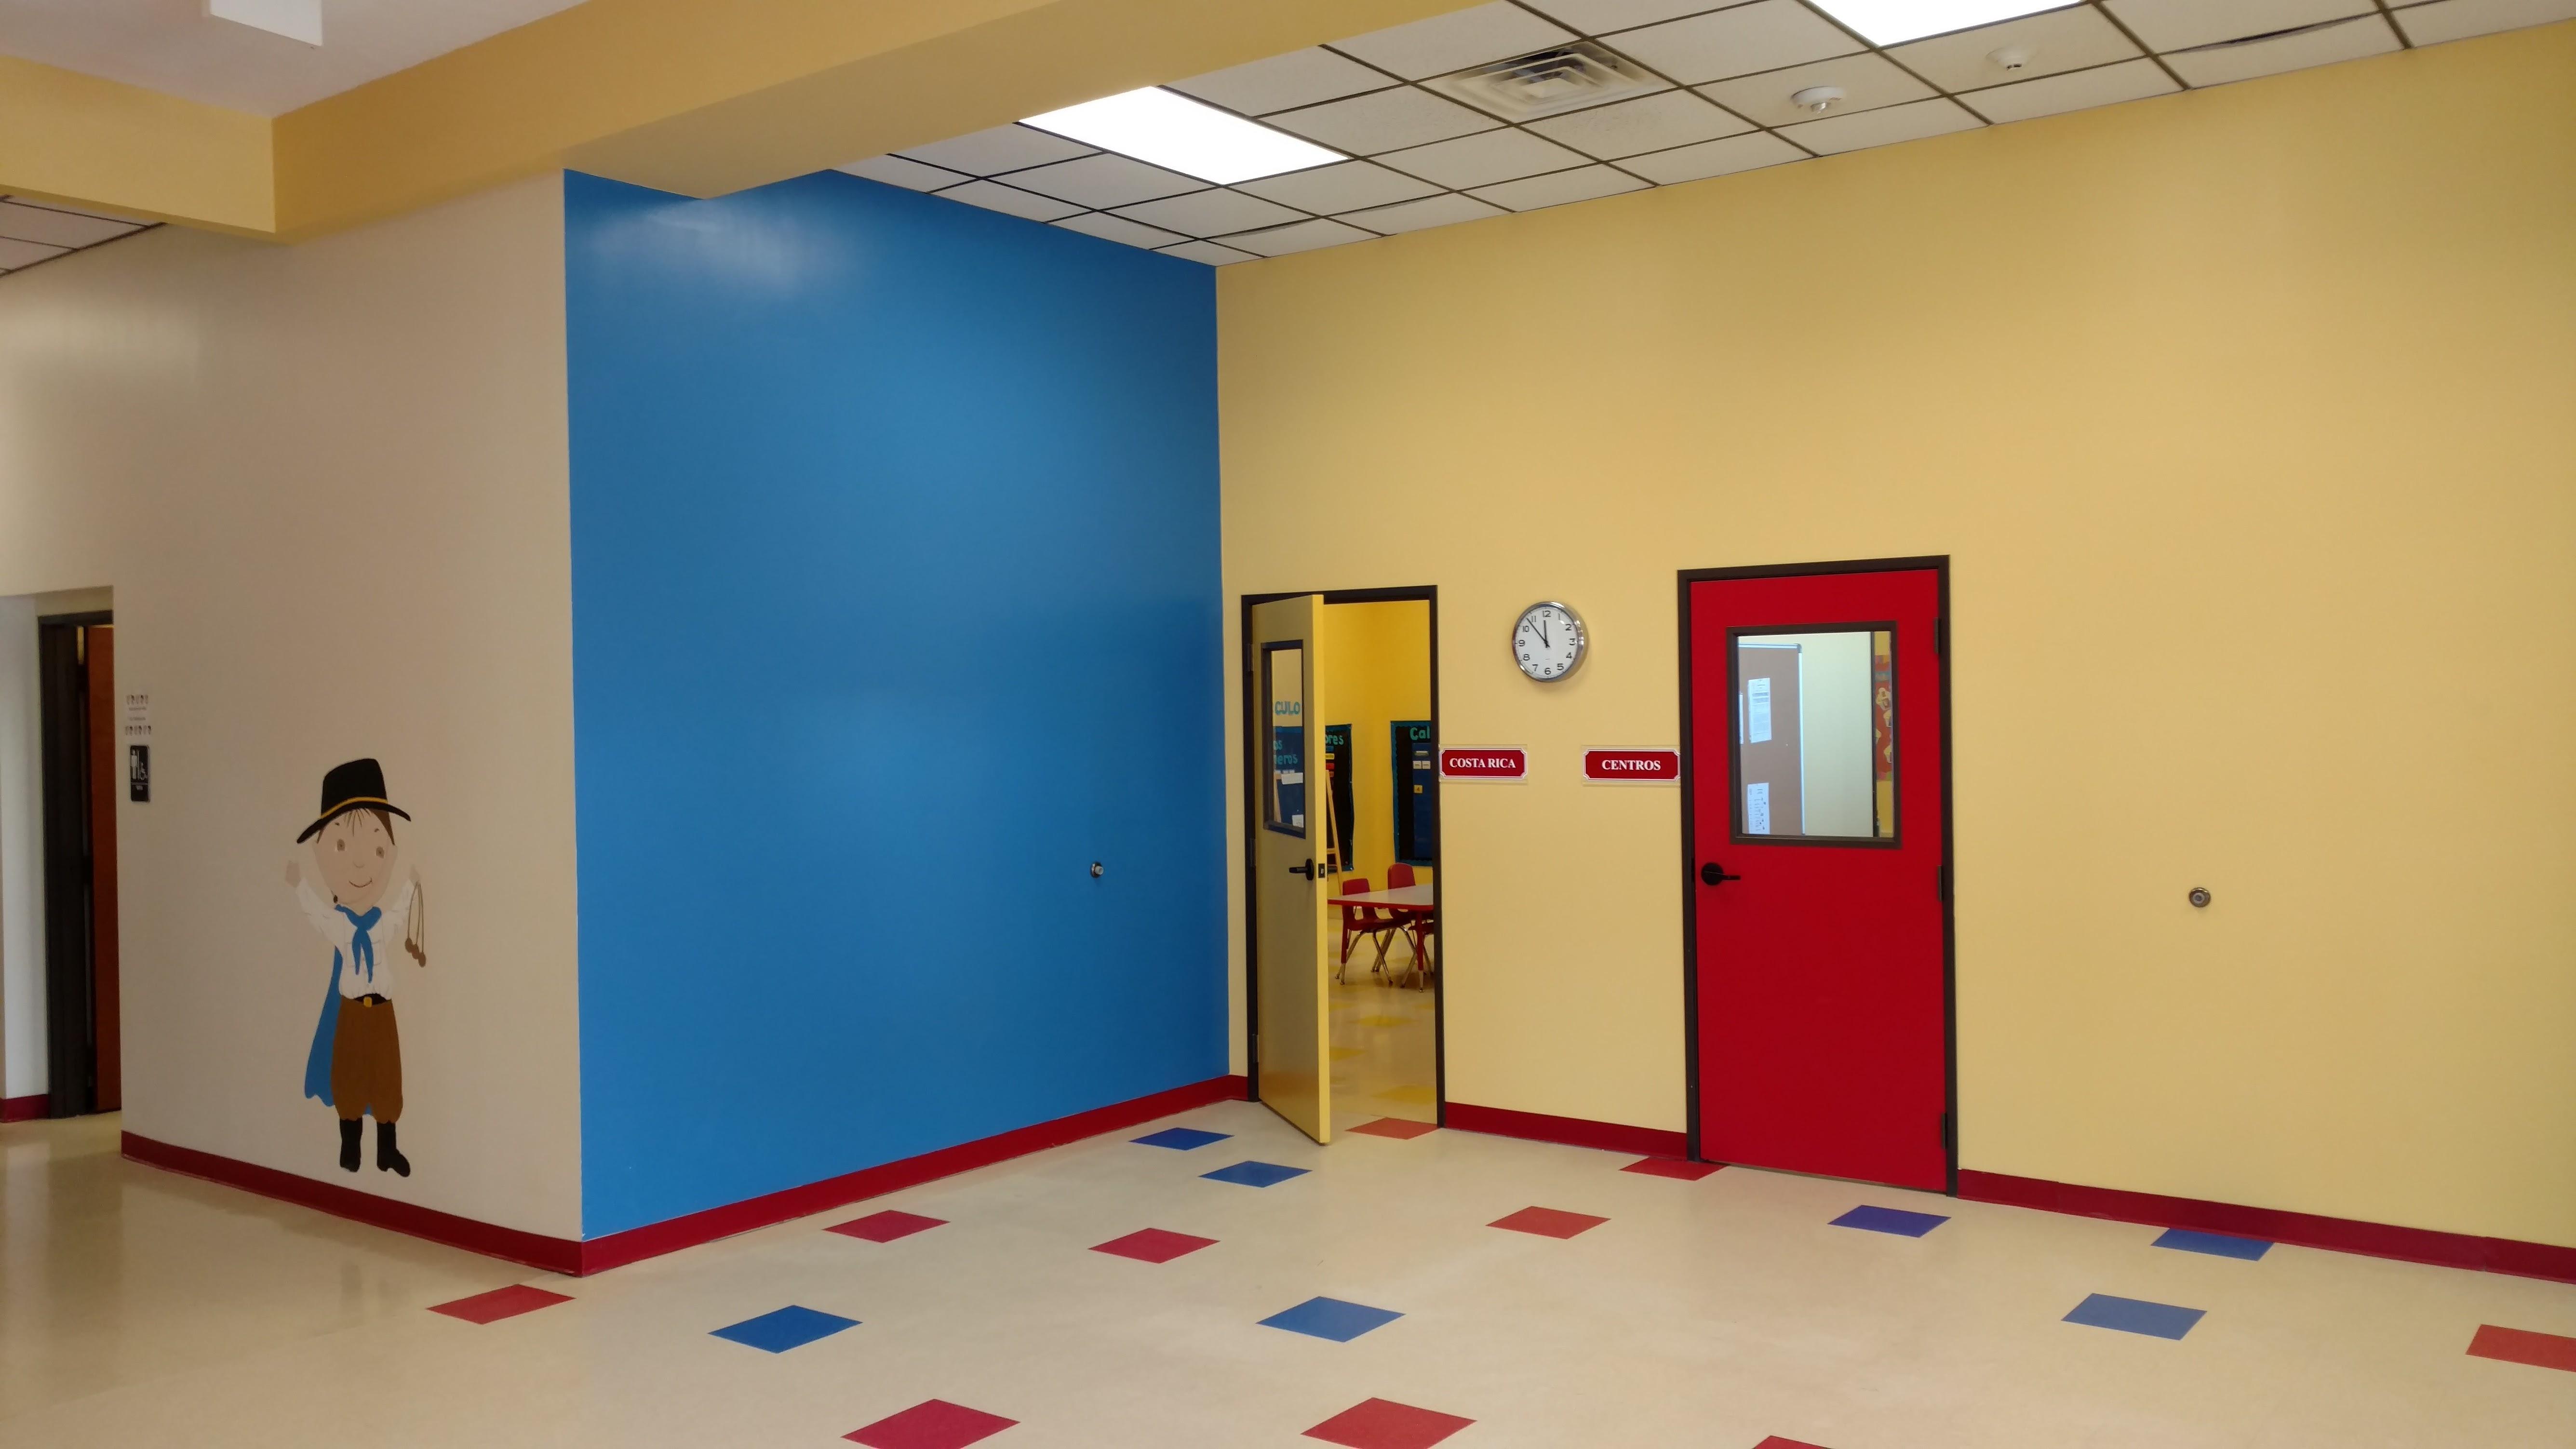 Spanish Schoolhouse image 2